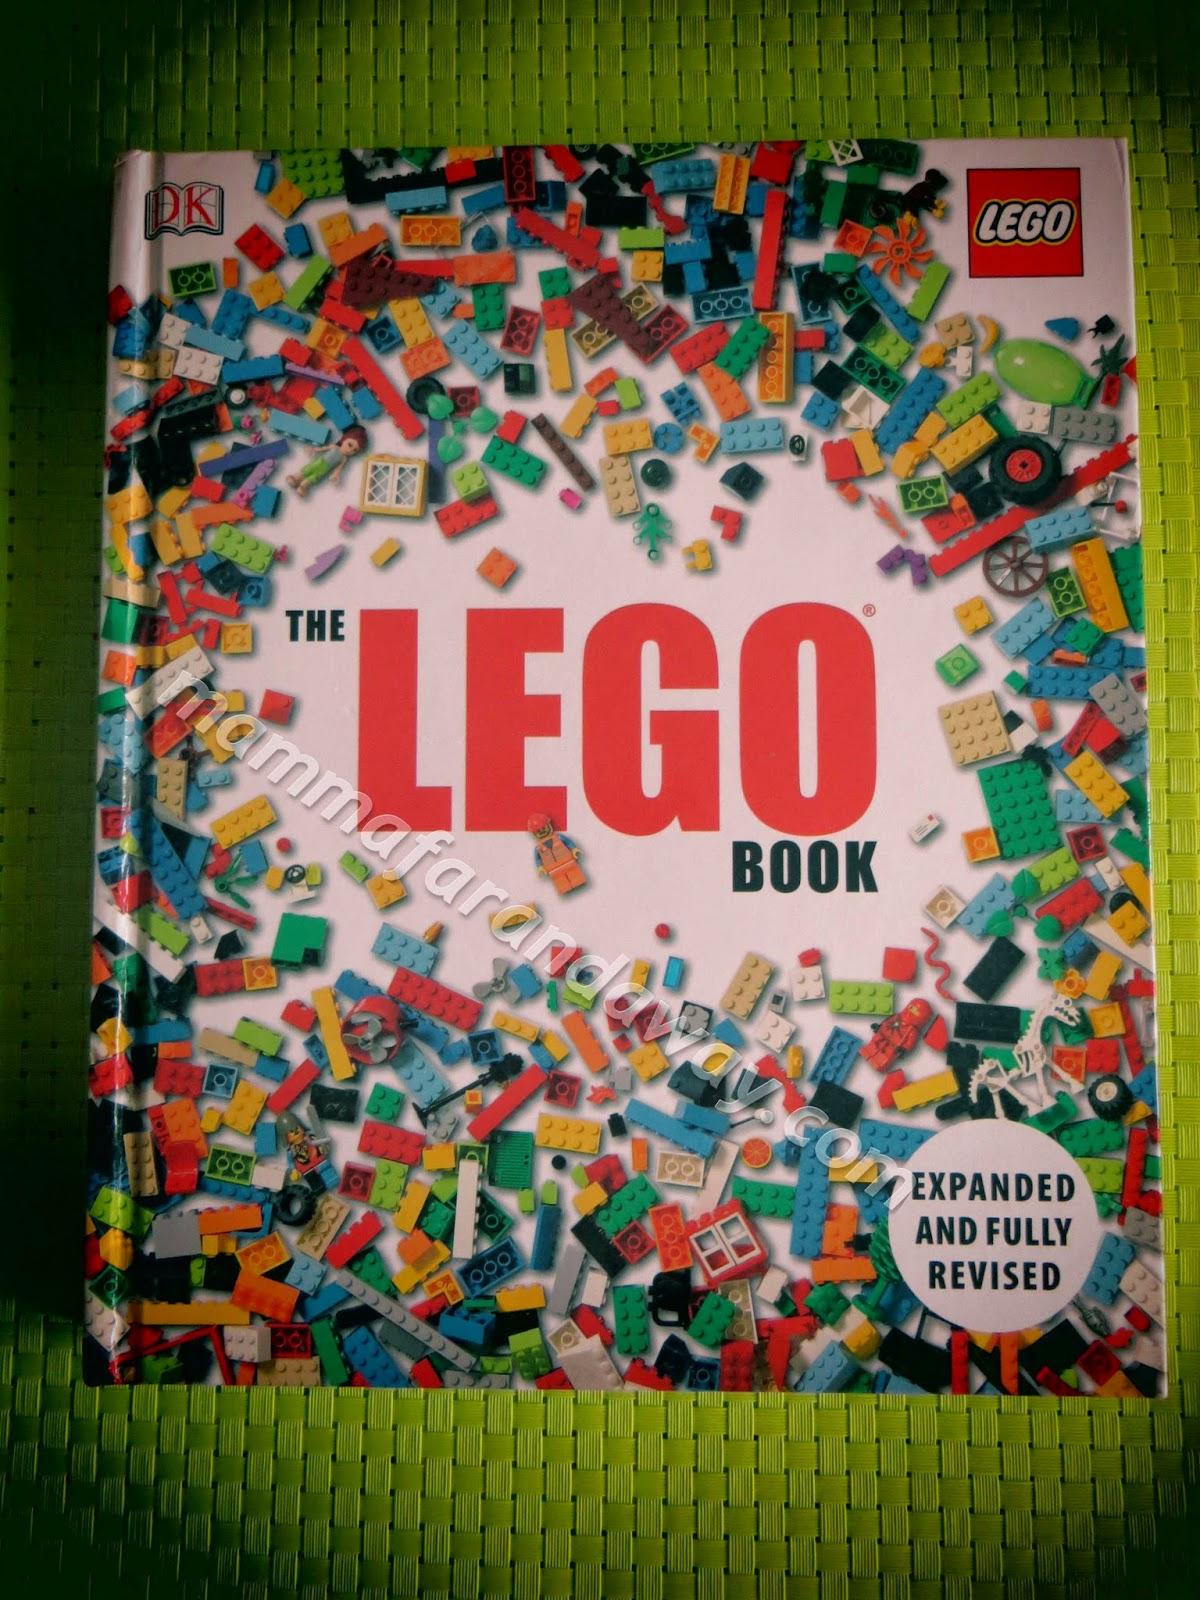 http://www.bookdepository.com/Lego-Book-Daniel-Lipkowitz/9780756666934/?a_aid=Mammafarandaway